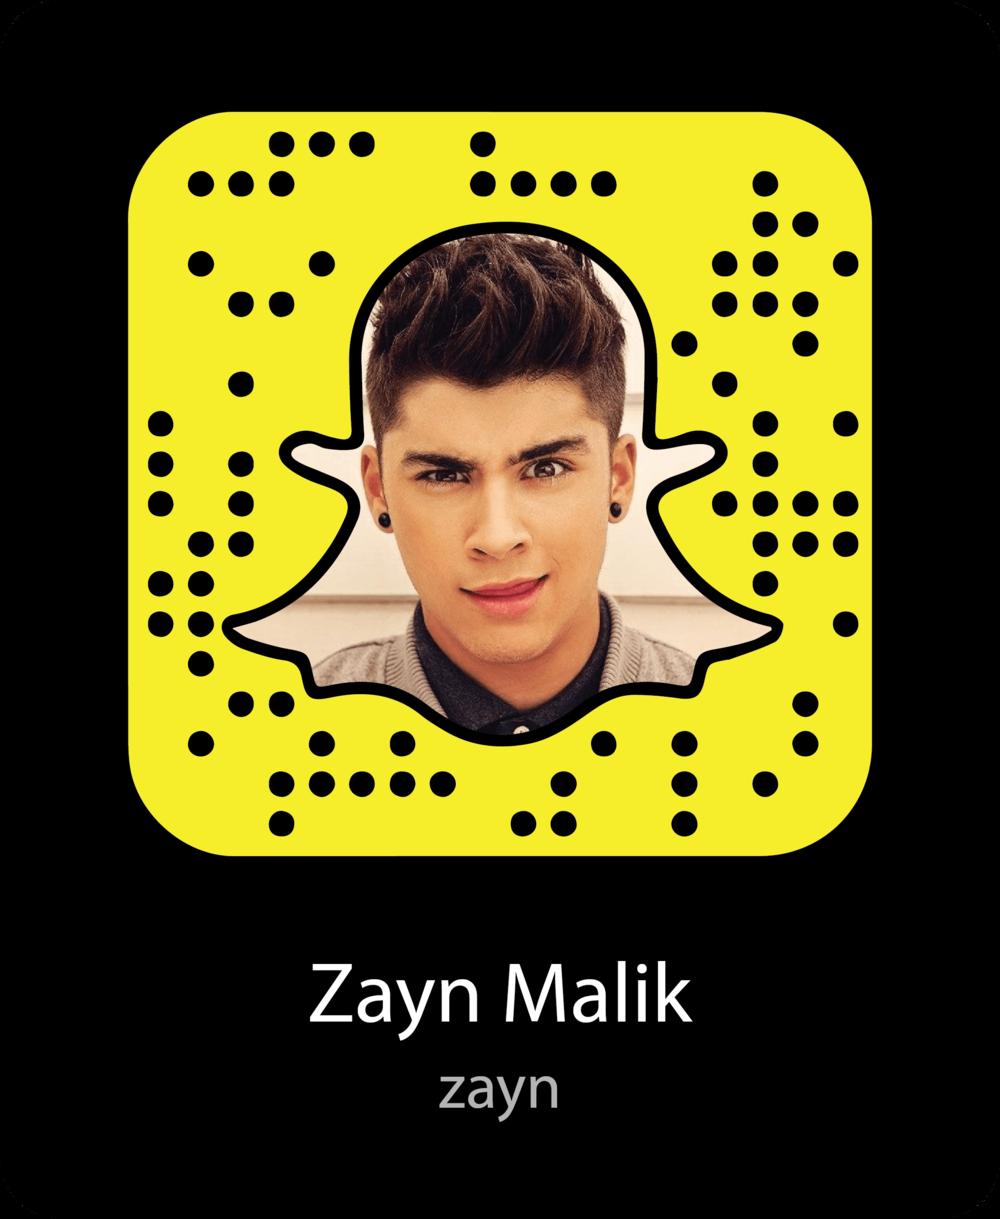 zayn-malik-celebrity-snapchat-snapcode